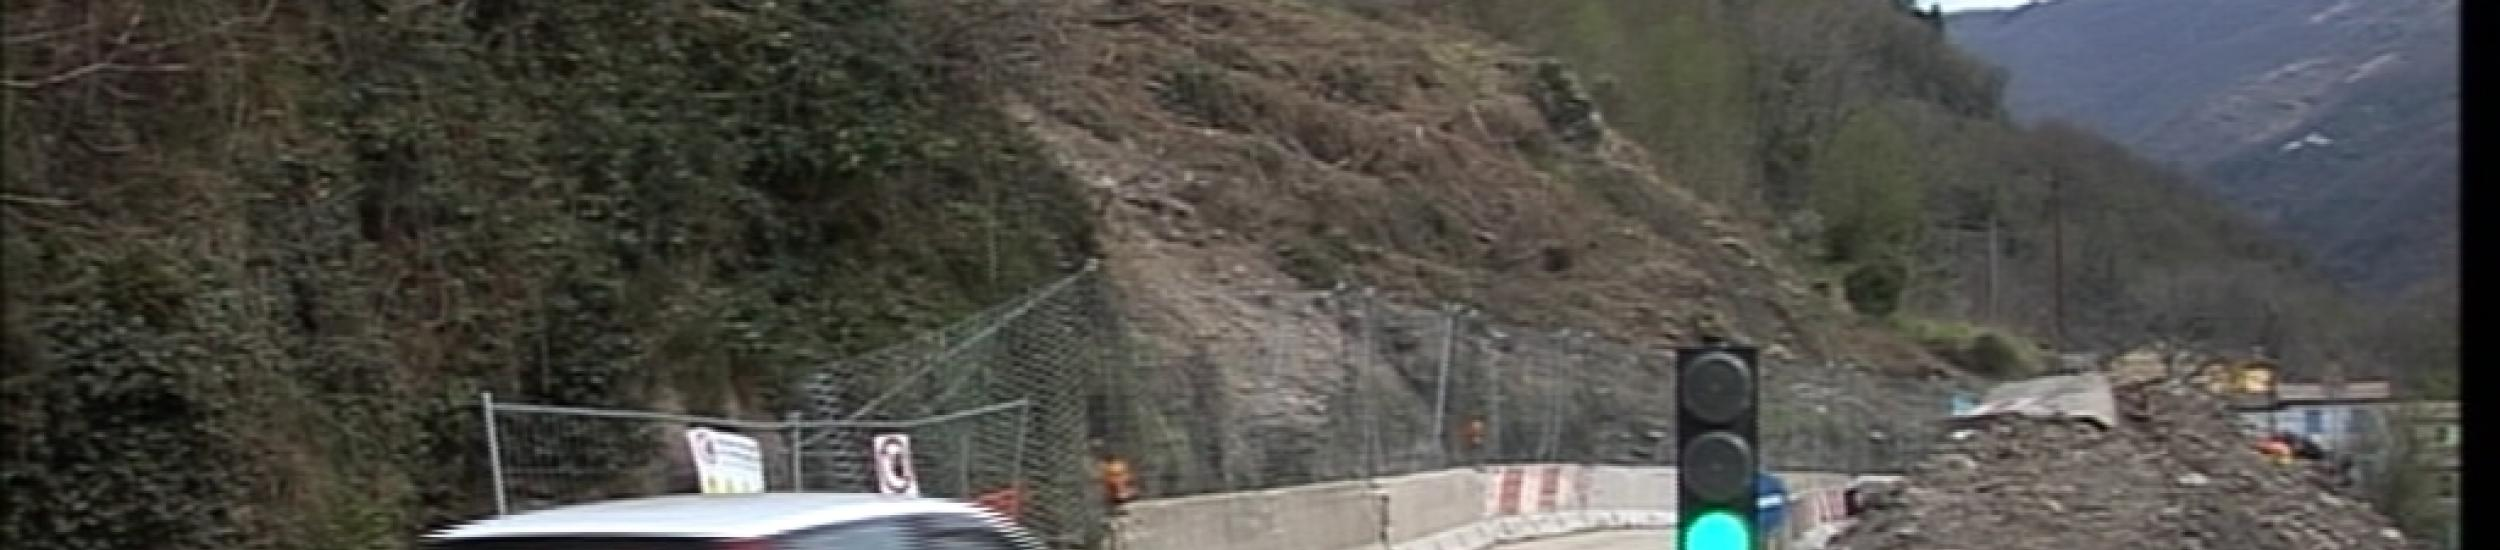 News: Scoglina, a lorsica la provinciale è riaperta